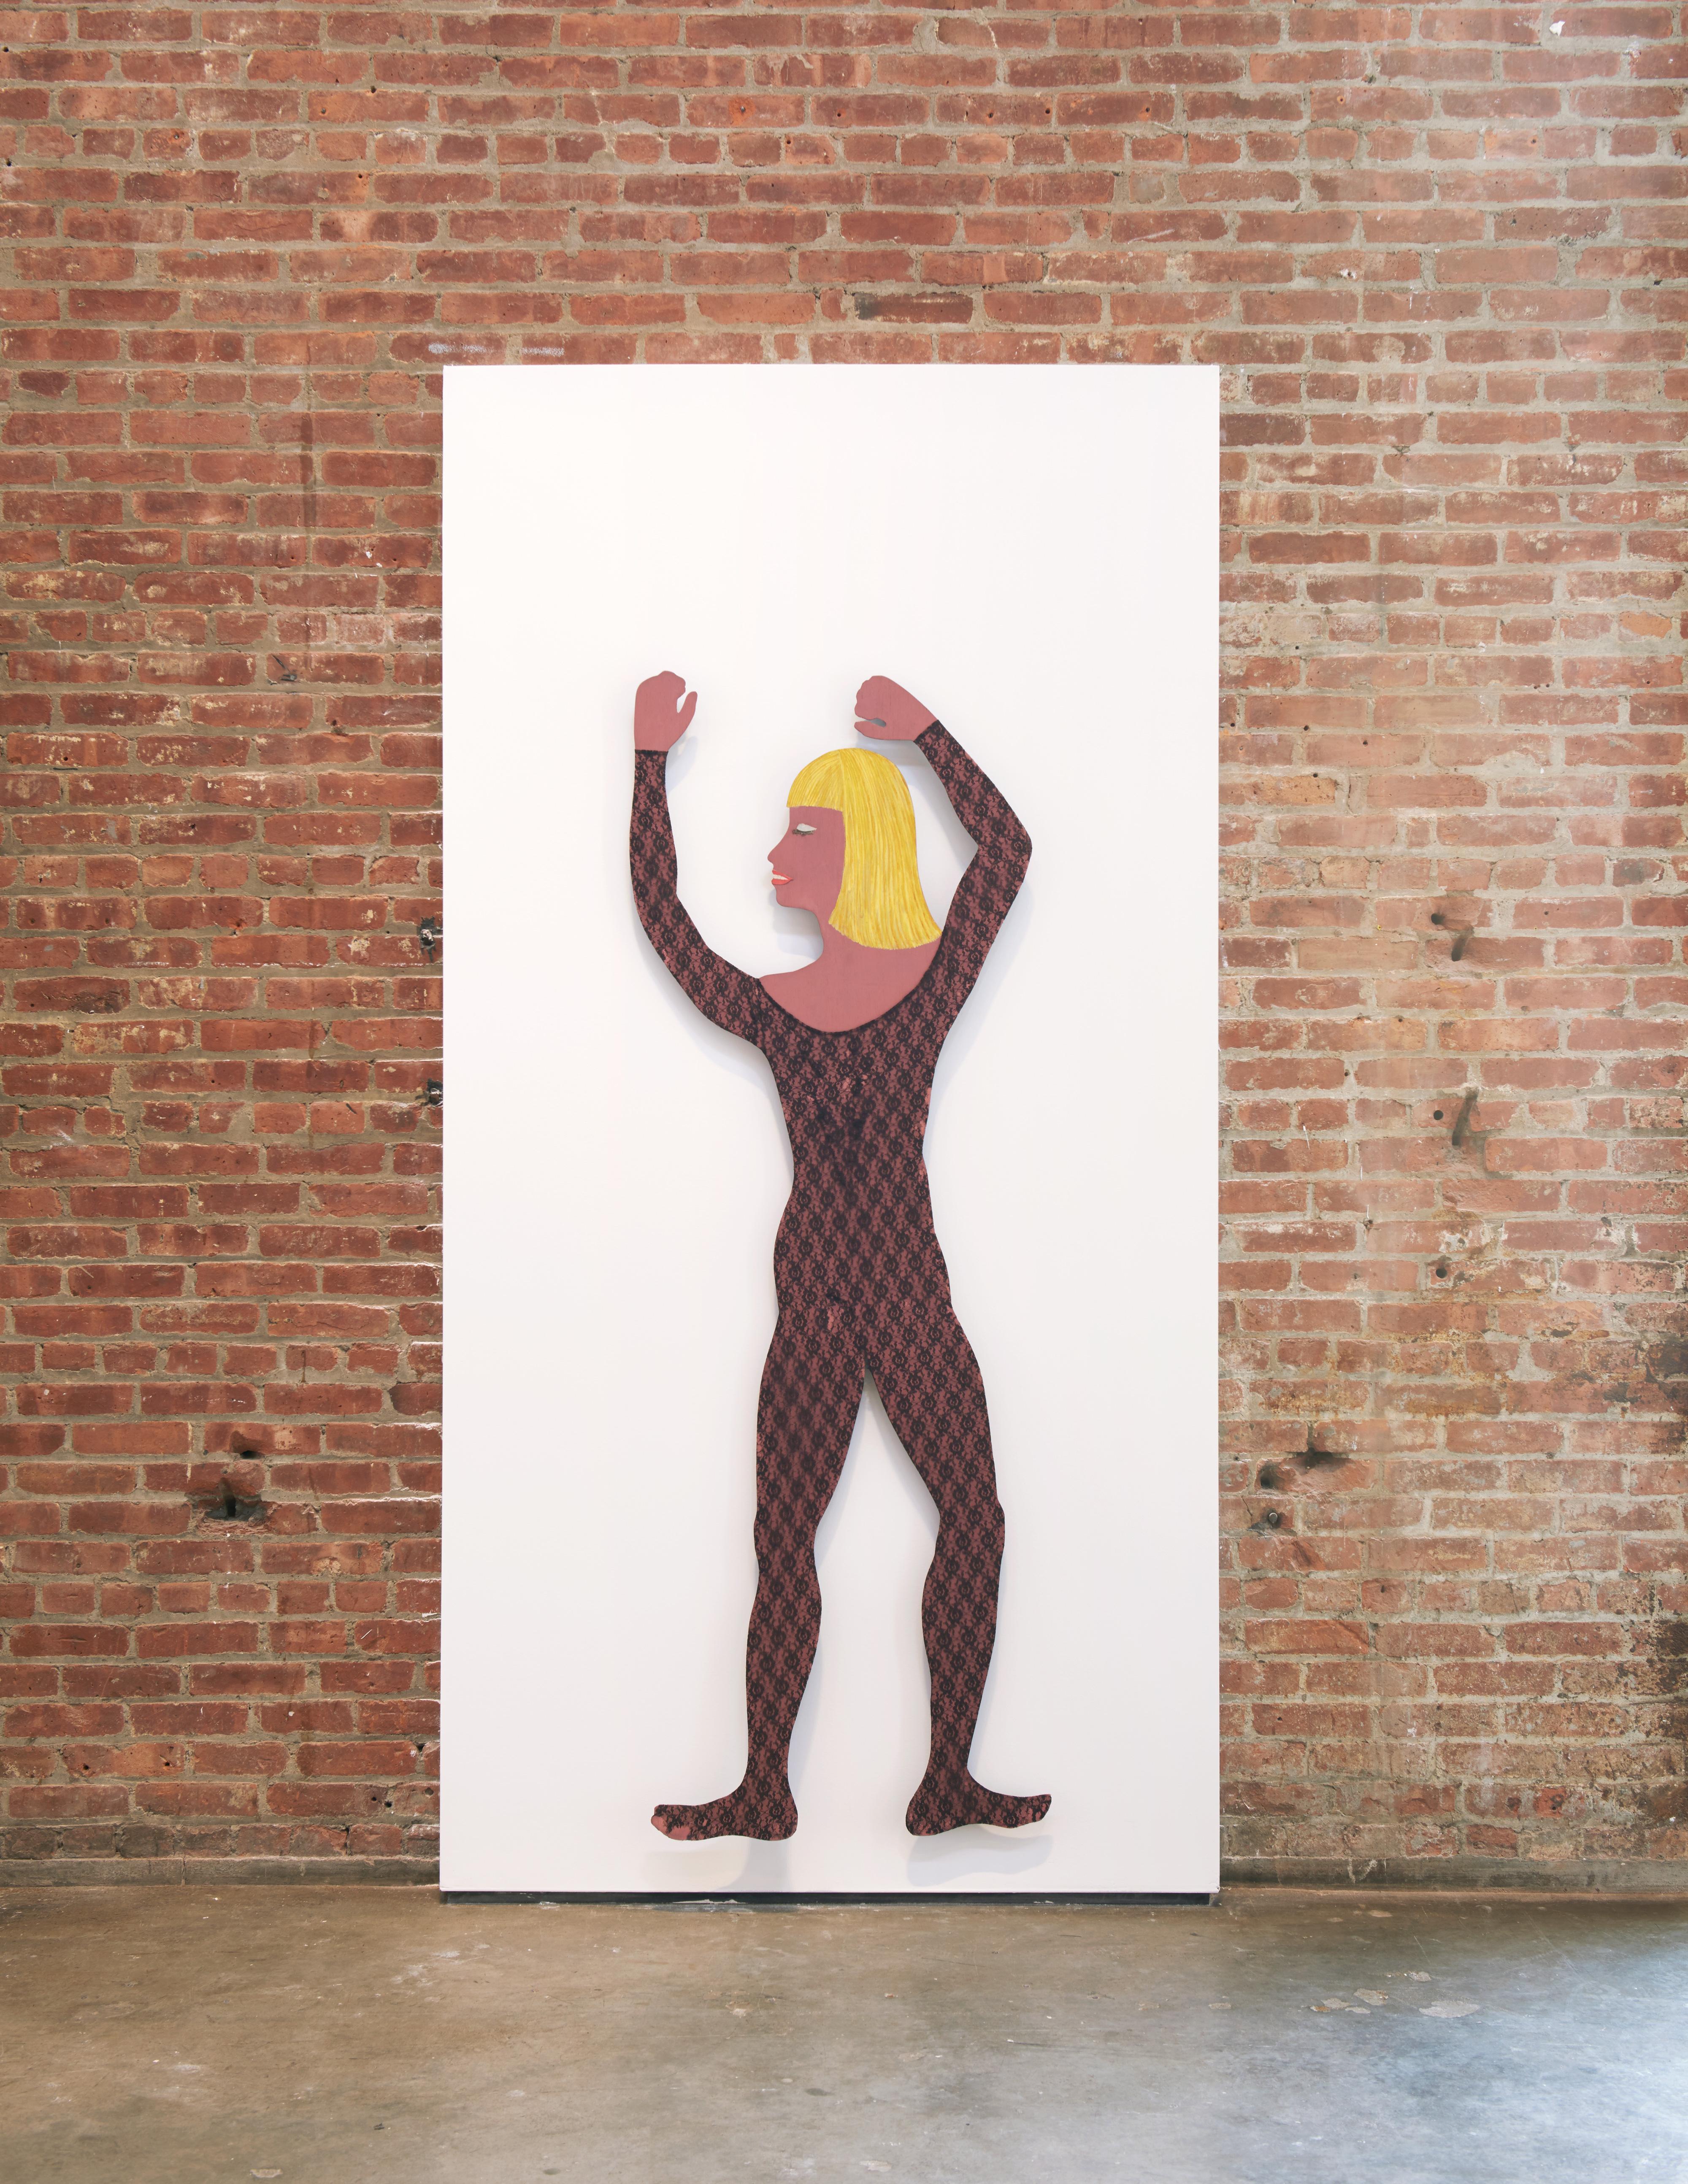 Galerie Barbara Thumm \ Teresa Burga – Mano Mal Dibujada